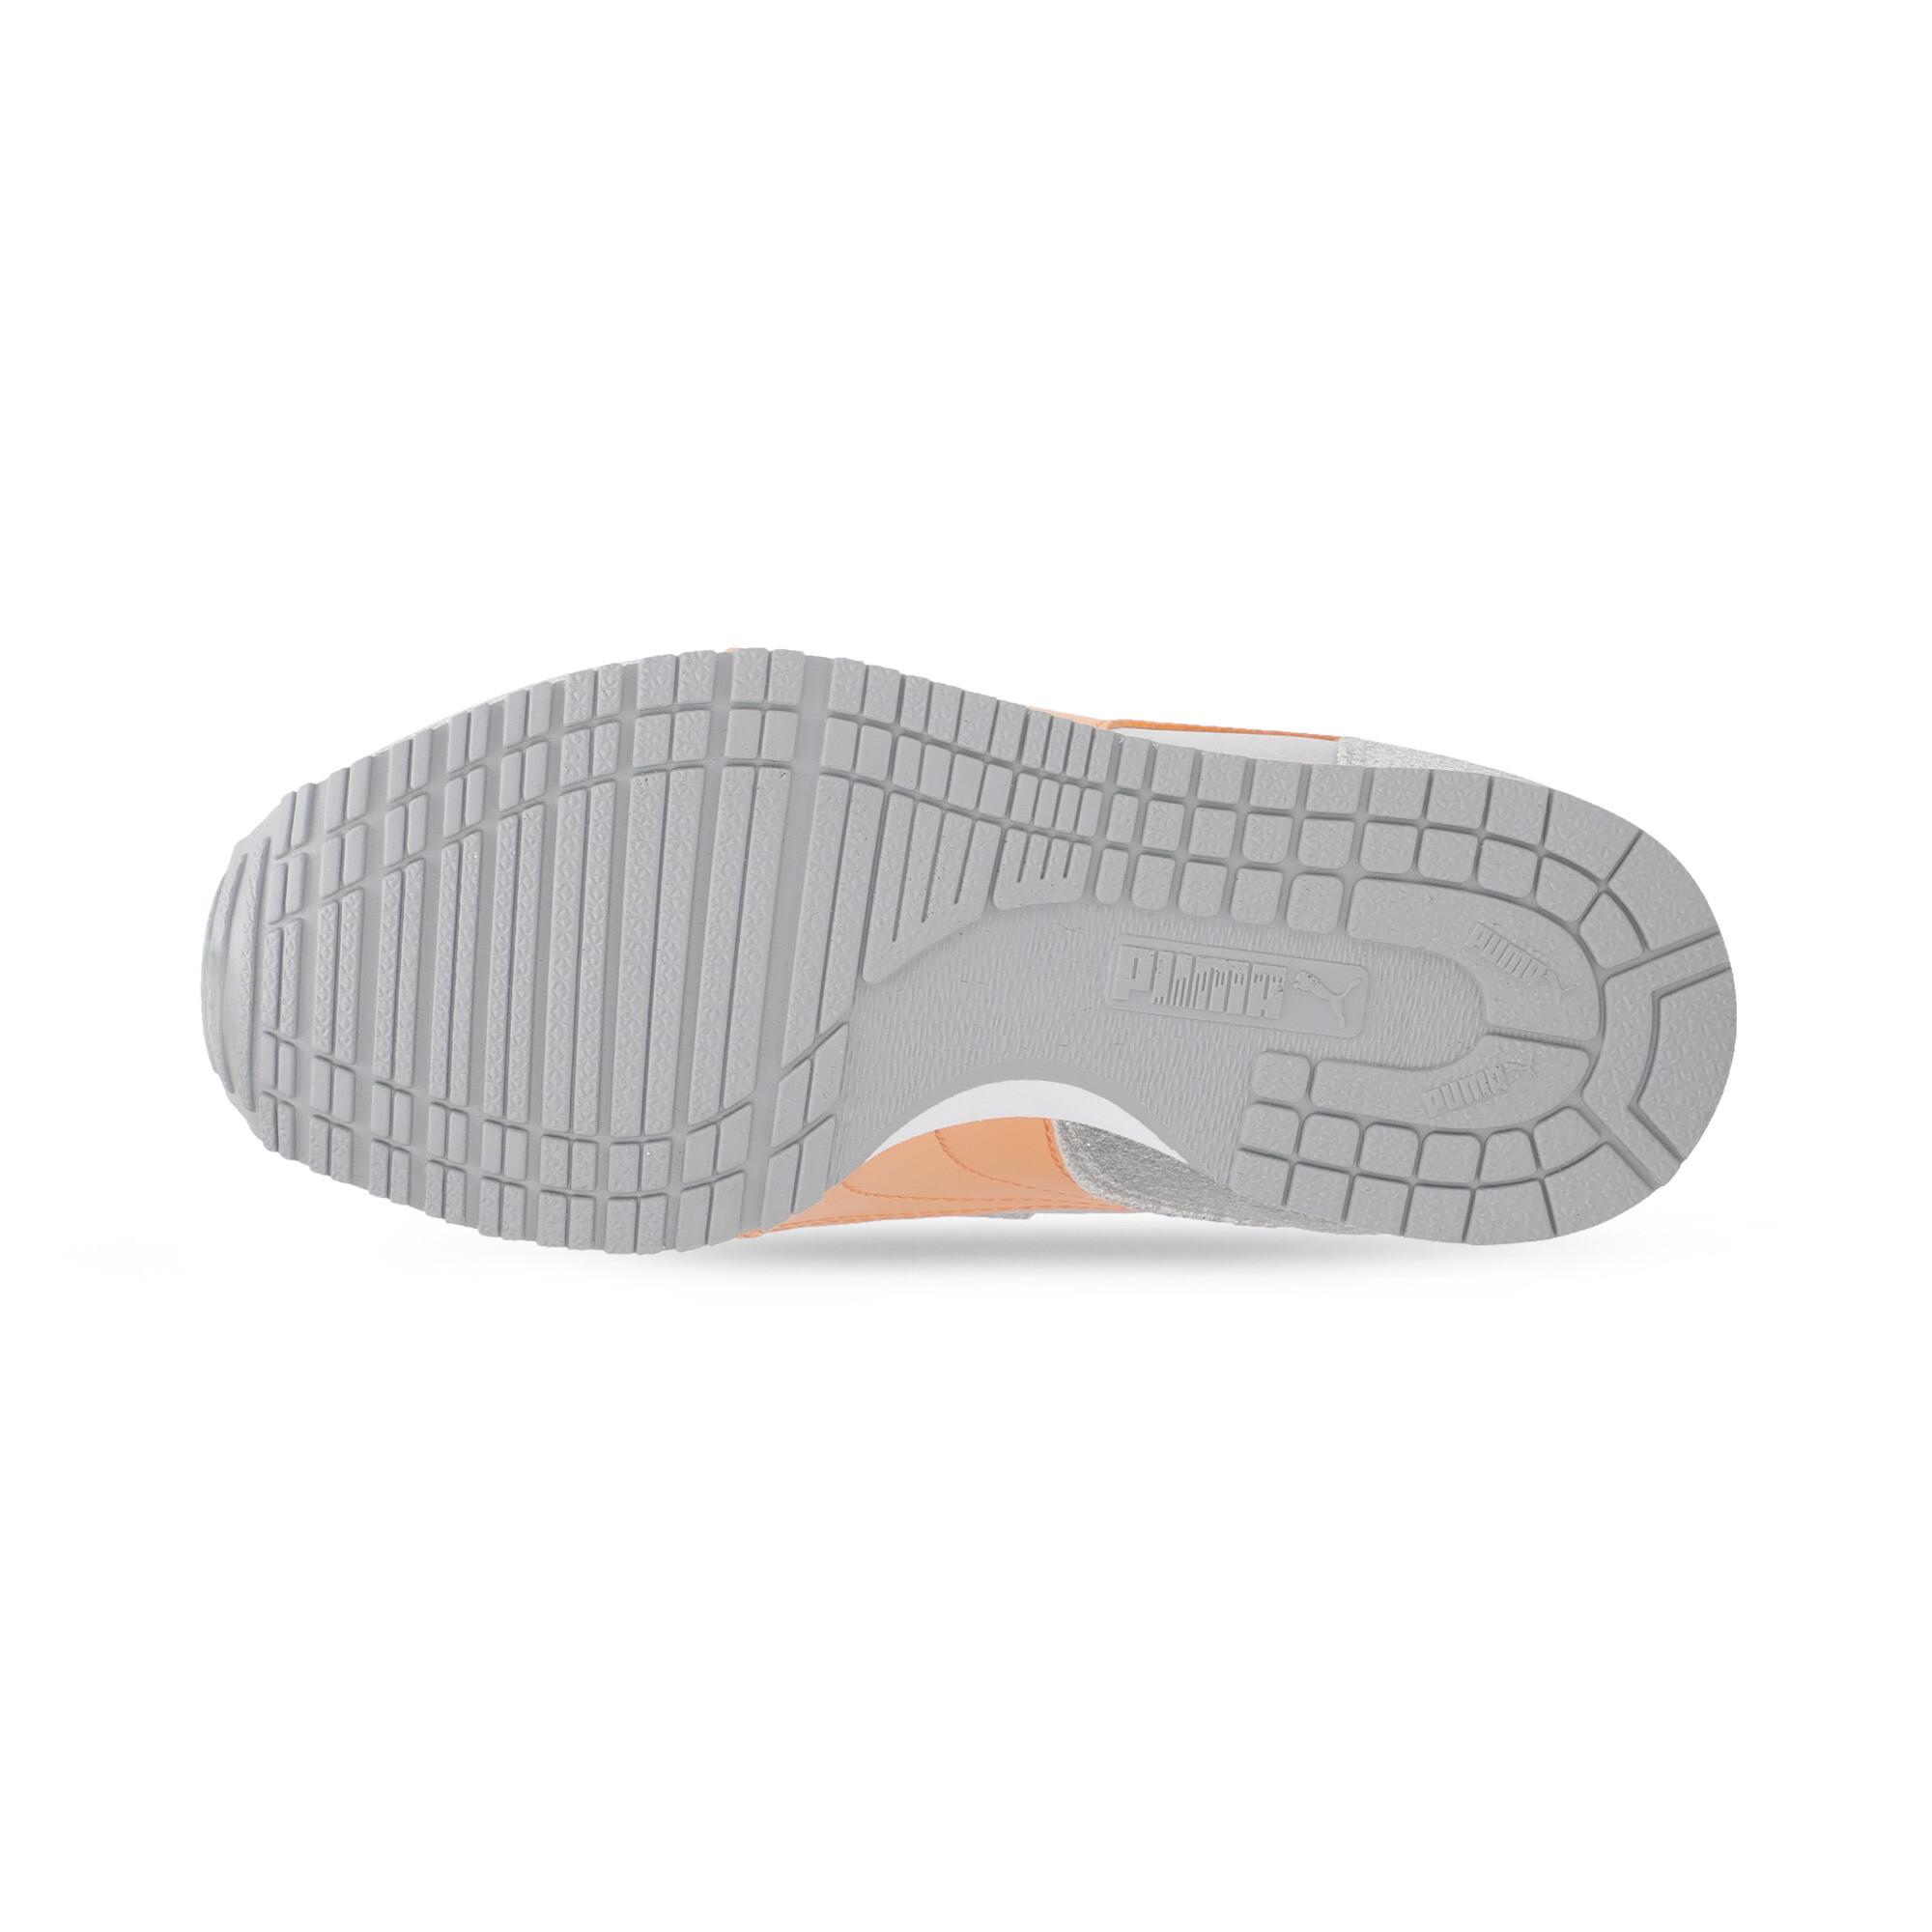 PUMA-Pre-School-Girl-039-s-Cabana-Racer-Glitz-AC-Shoes thumbnail 23